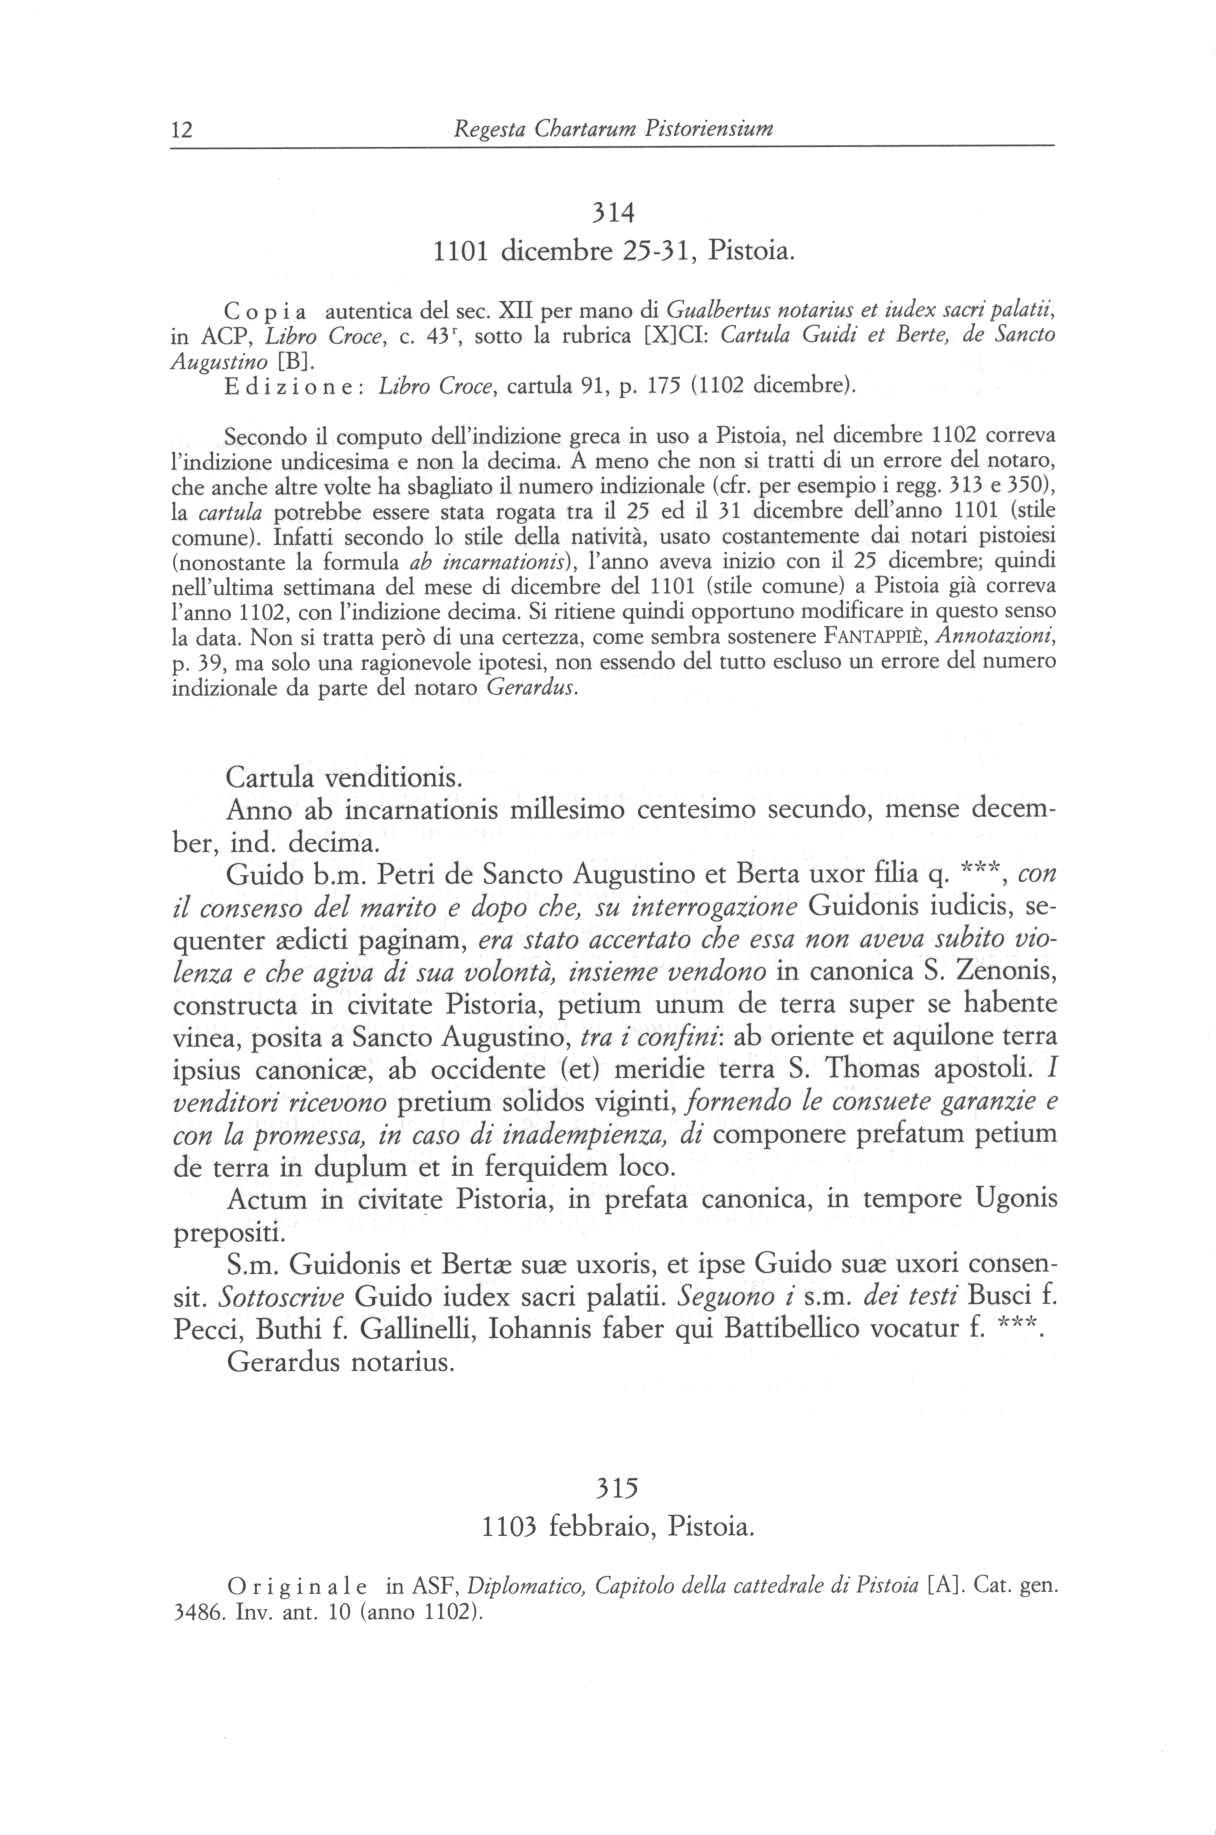 Canonica S. Zenone XII 0012.jpg